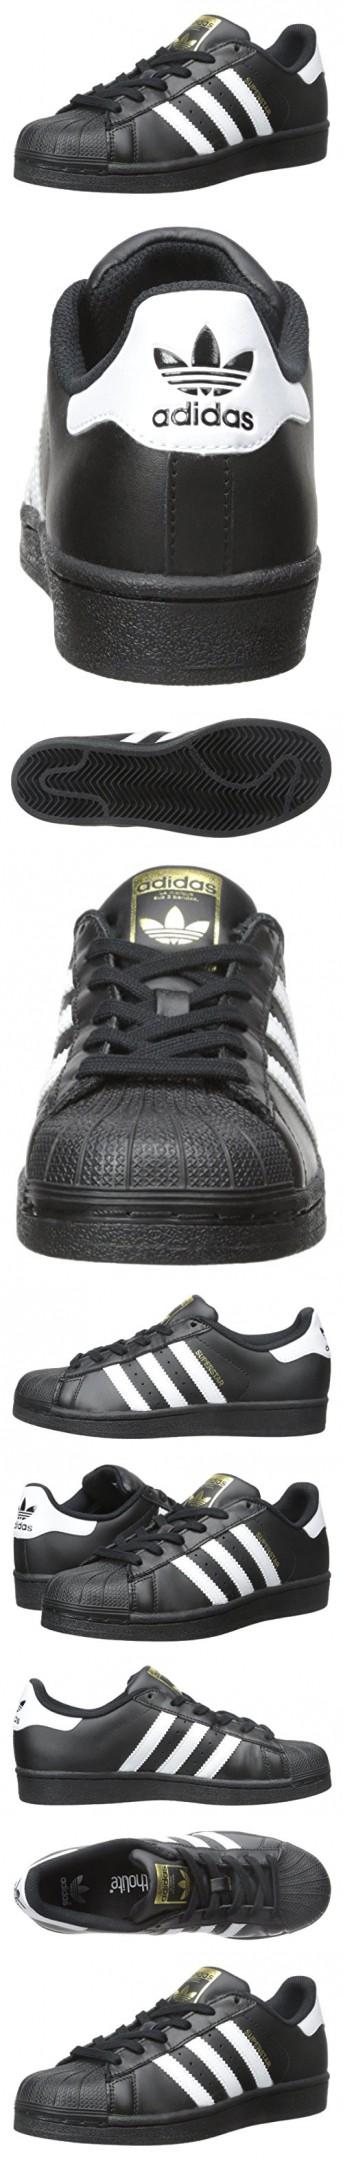 Adidas Originals Superstar Foundation J Casual Basketball-Inspired Low-Cut  Sneaker (Big Kid 46429ce014d2e